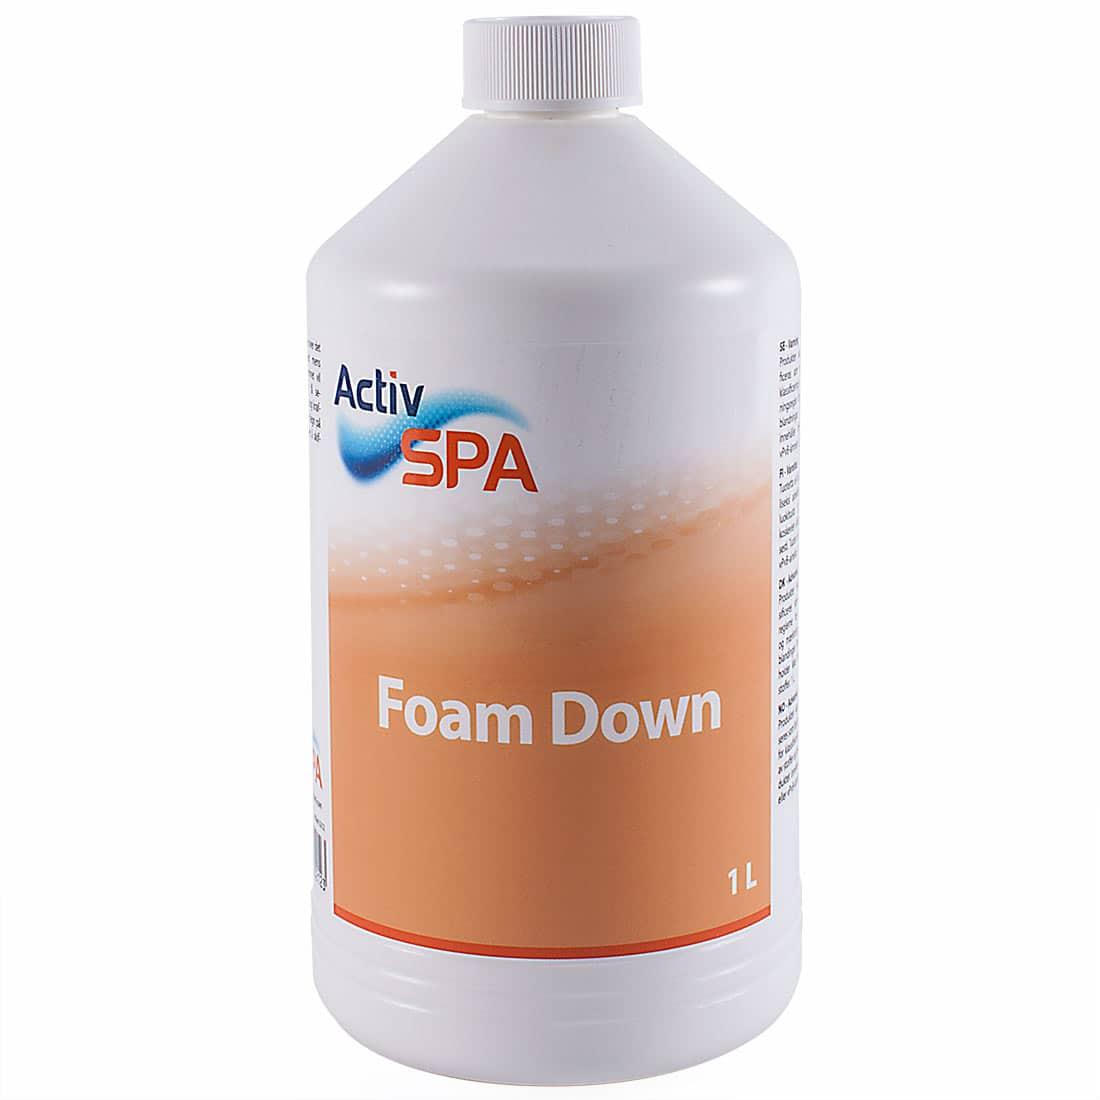 Activ Spa Foam Down